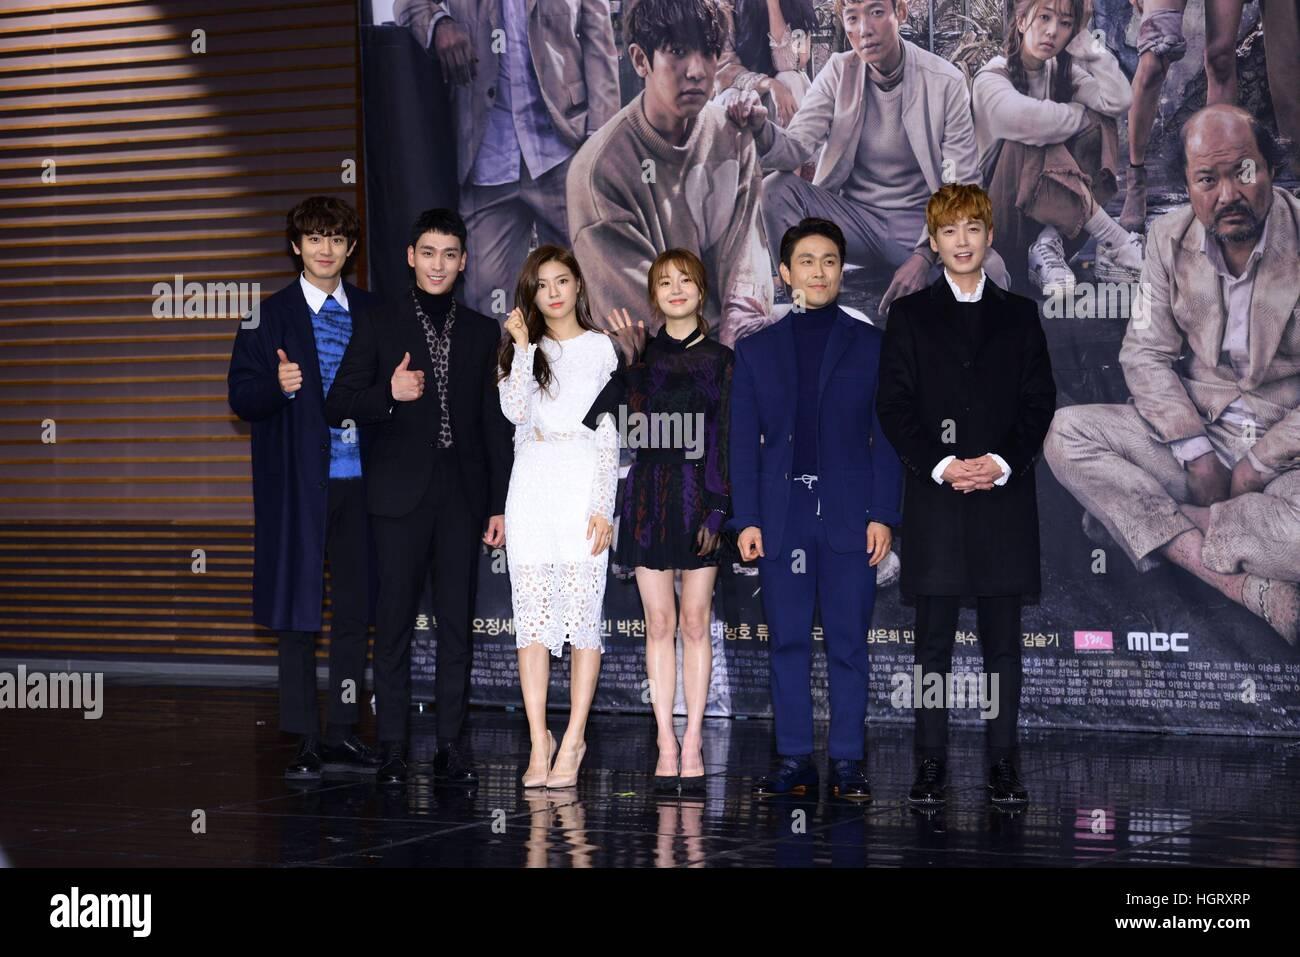 Seoul, Korea  12th Jan, 2017  Chanyeol, Tae-jun Choe, Jin